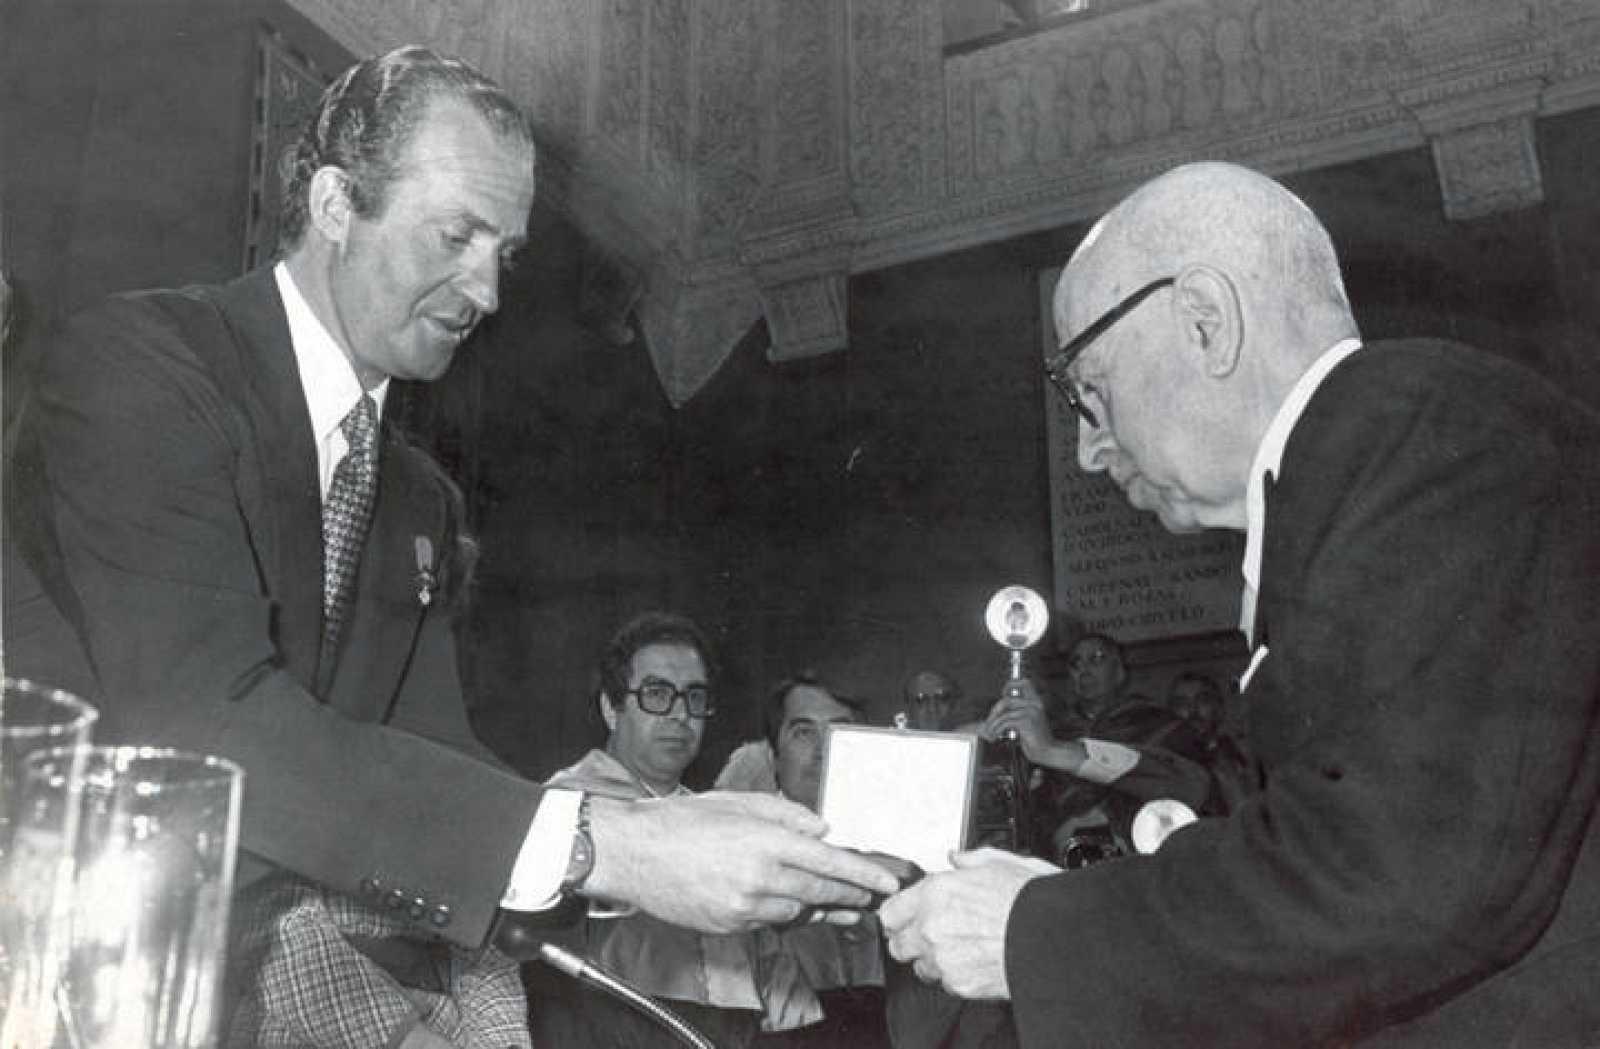 Dámaso Alonso, Premio Cervantes 1978